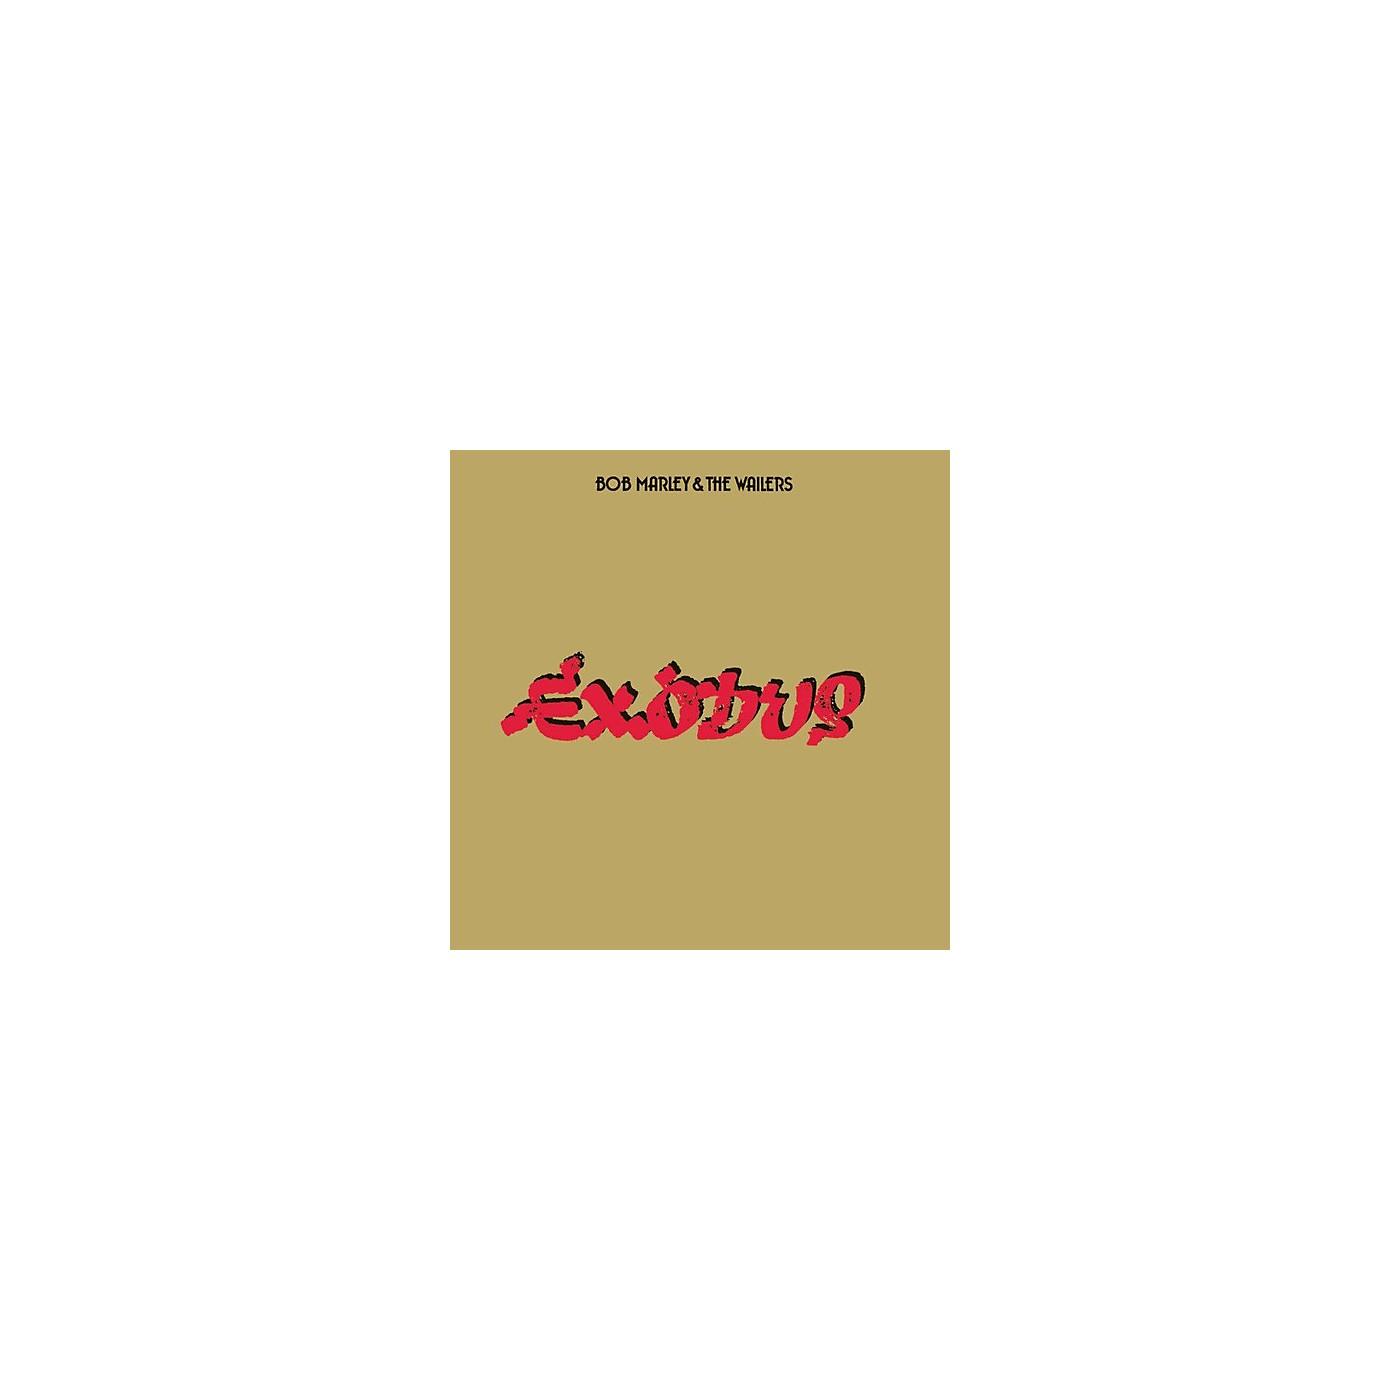 Alliance Bob Marley - Exodus thumbnail